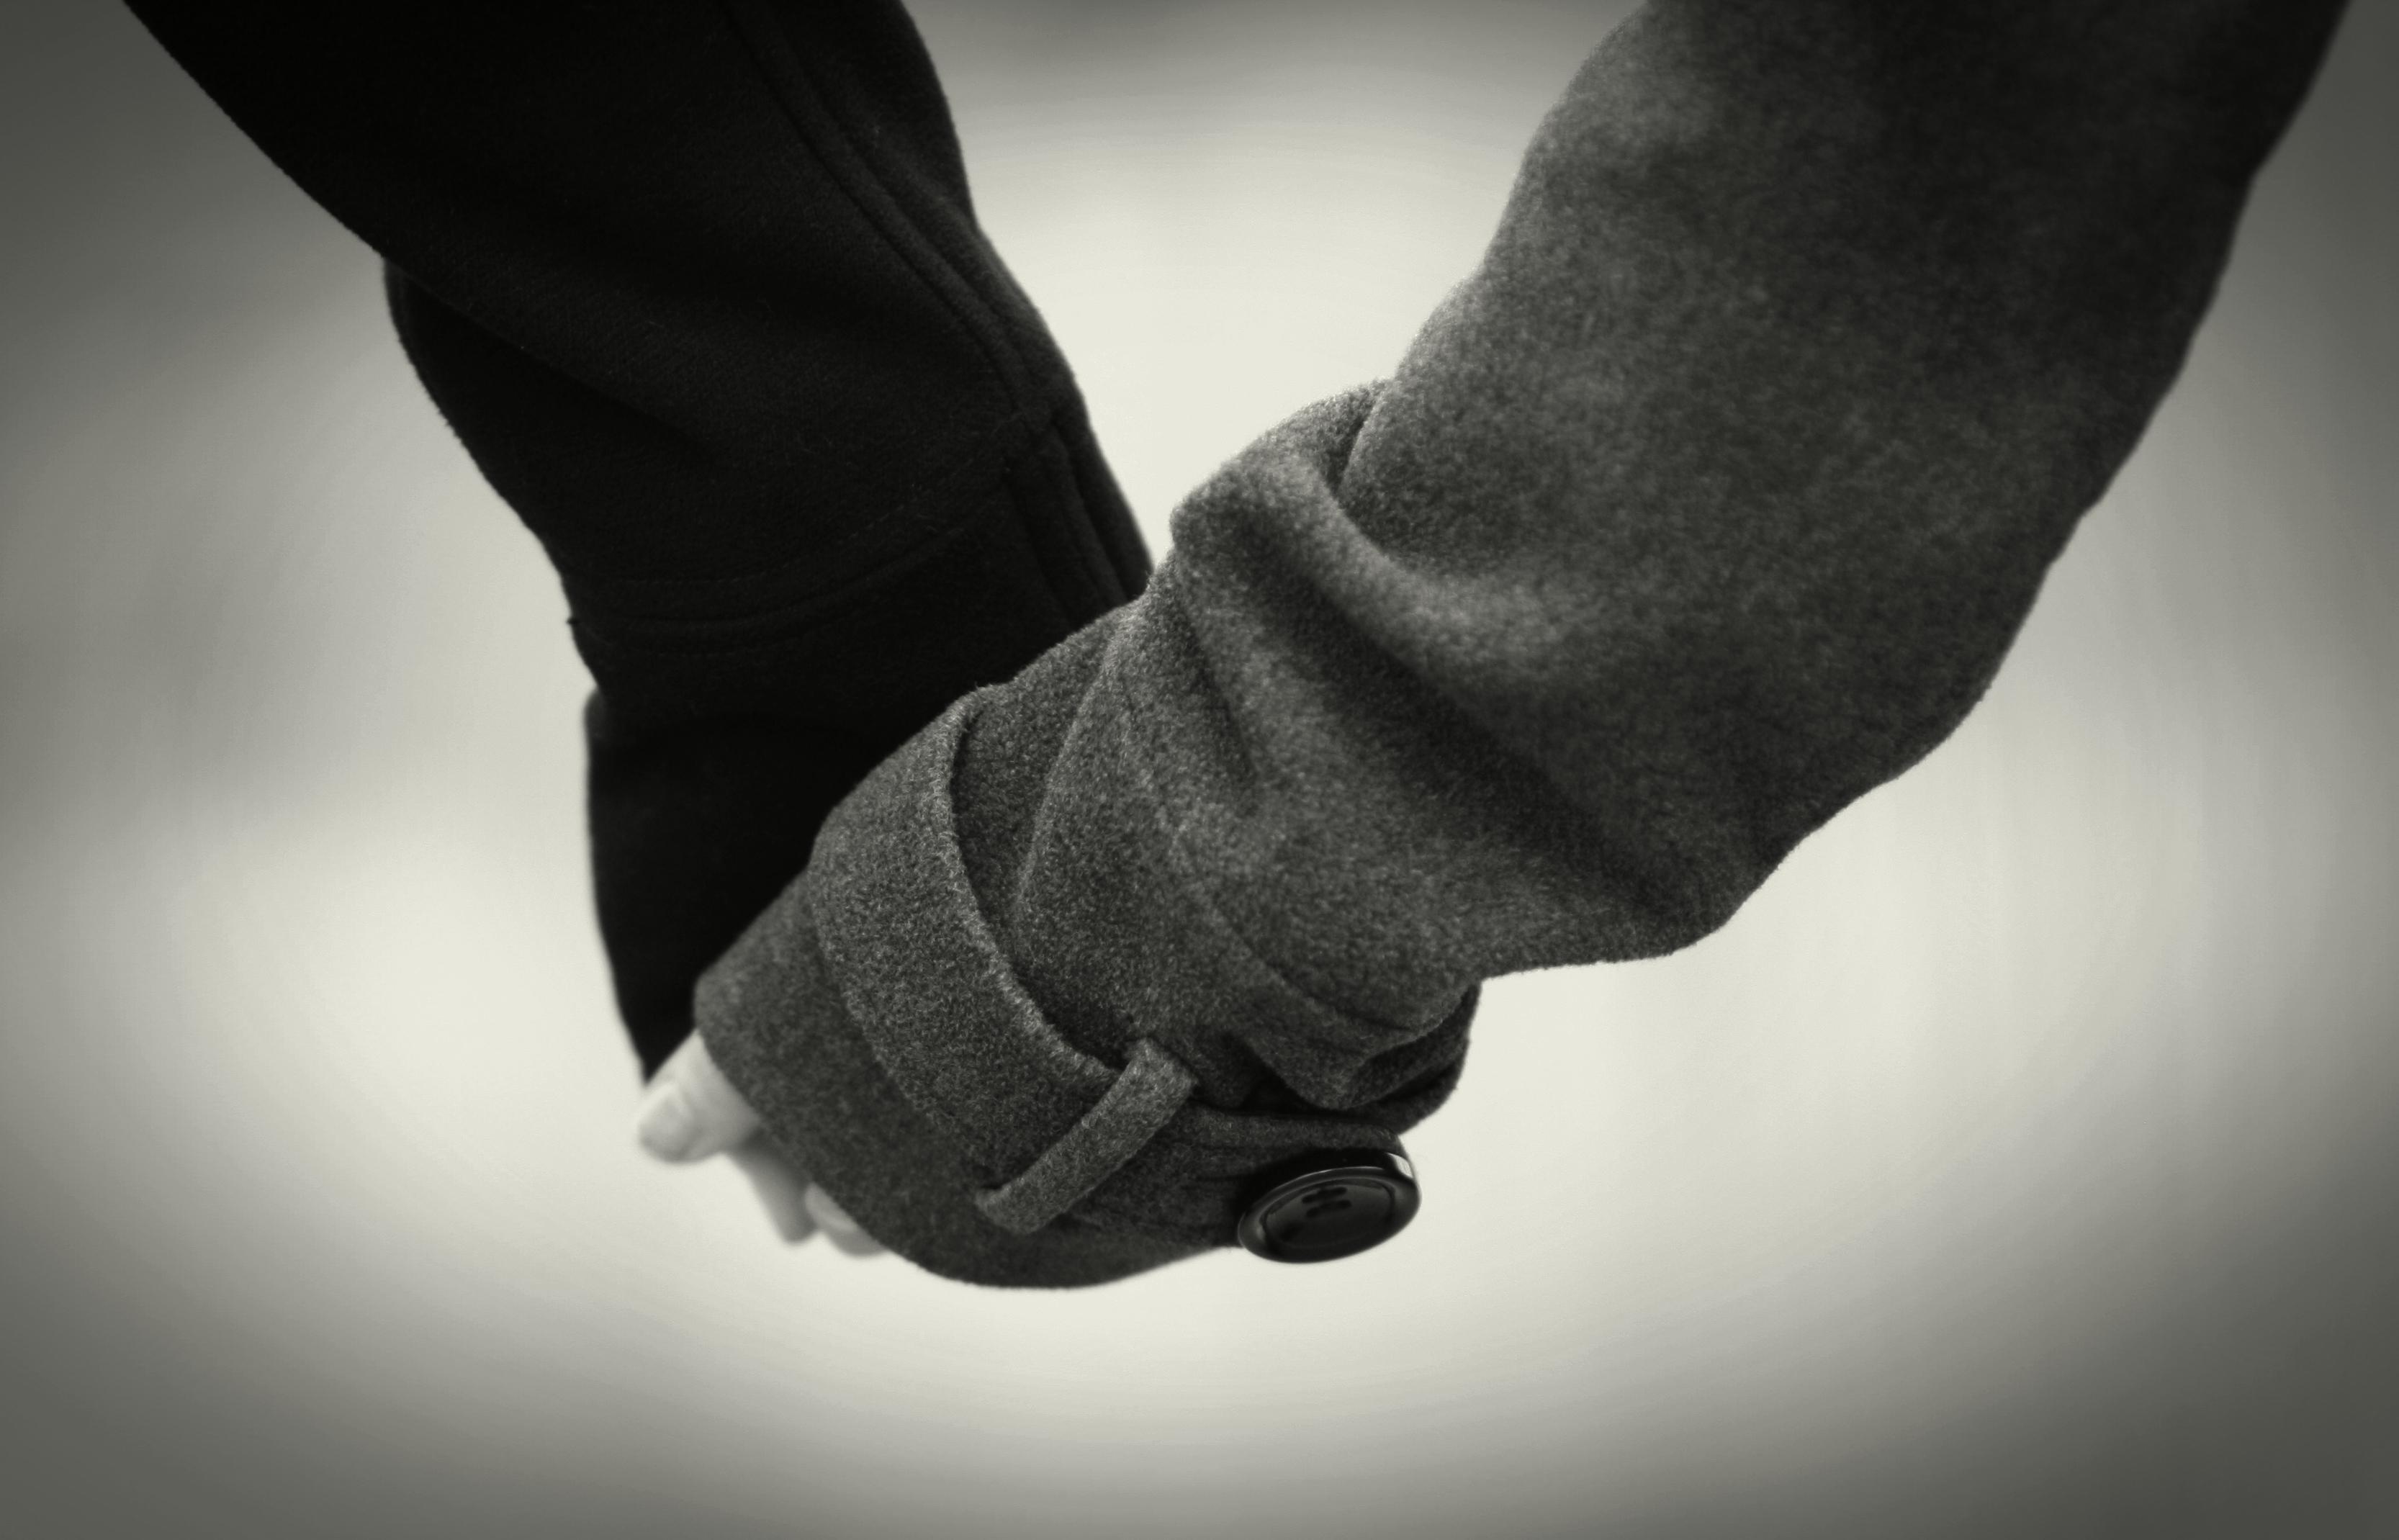 Hand Holding Black And White   www.imgkid.com - The Image ...